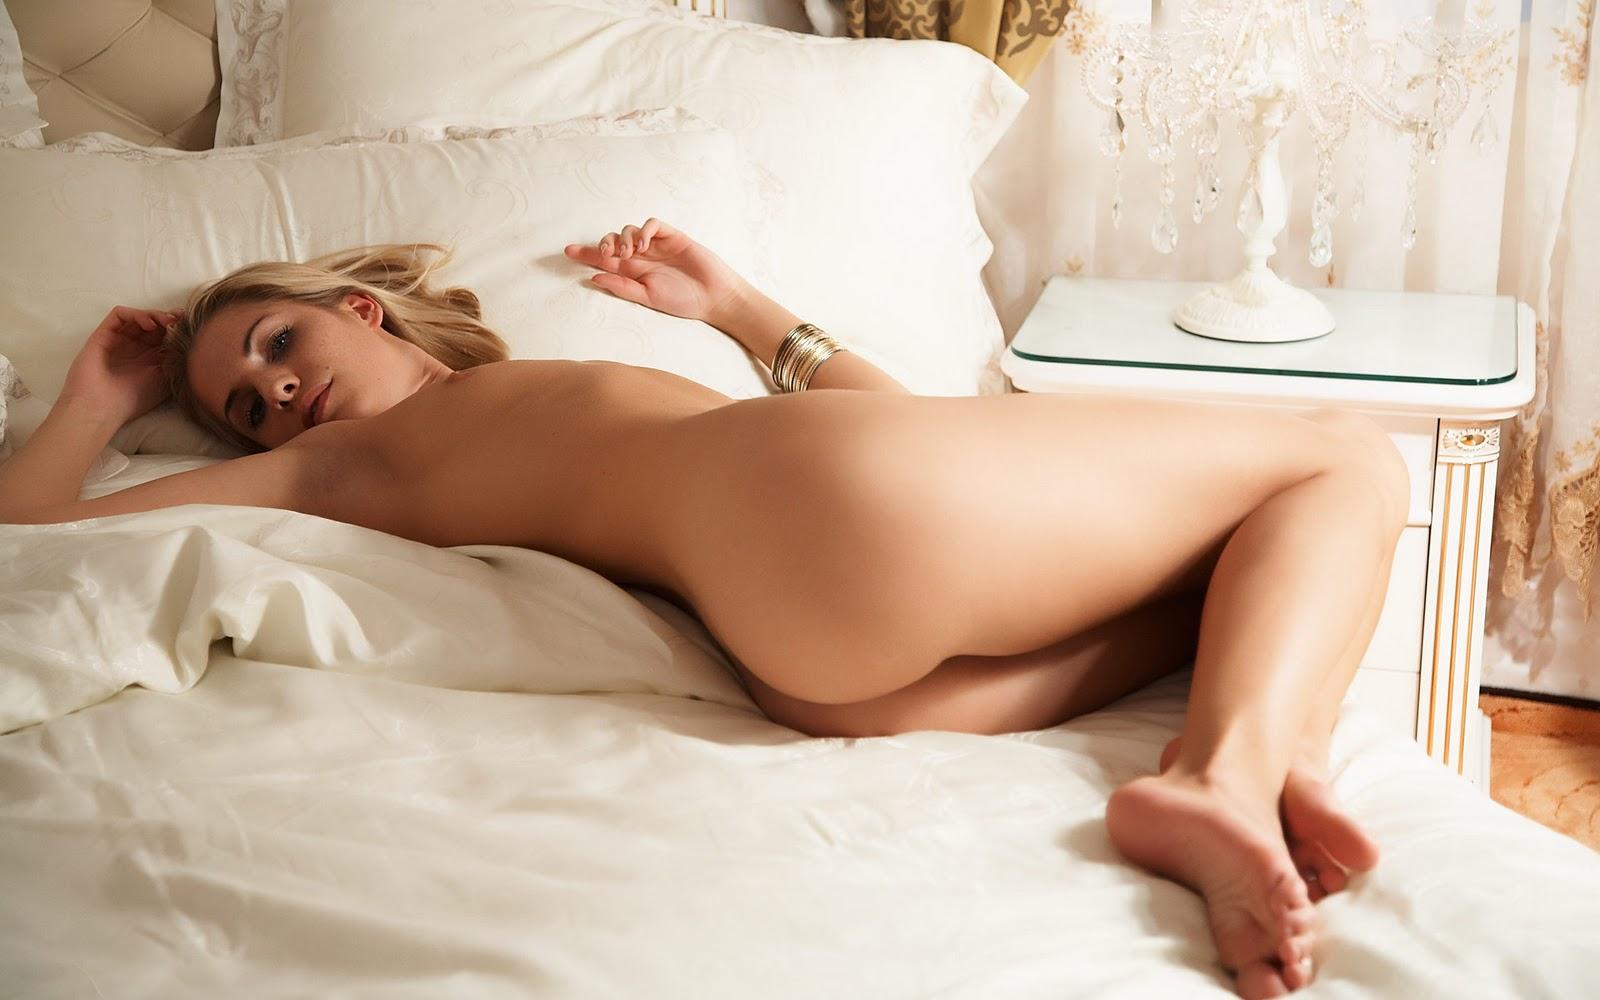 Erotic%252BWallpapers%252B %252BFreeHD.Blogspot.Com%252B%252B%25252528377%25252529%252B.%252B sexy tattooed blonde babe